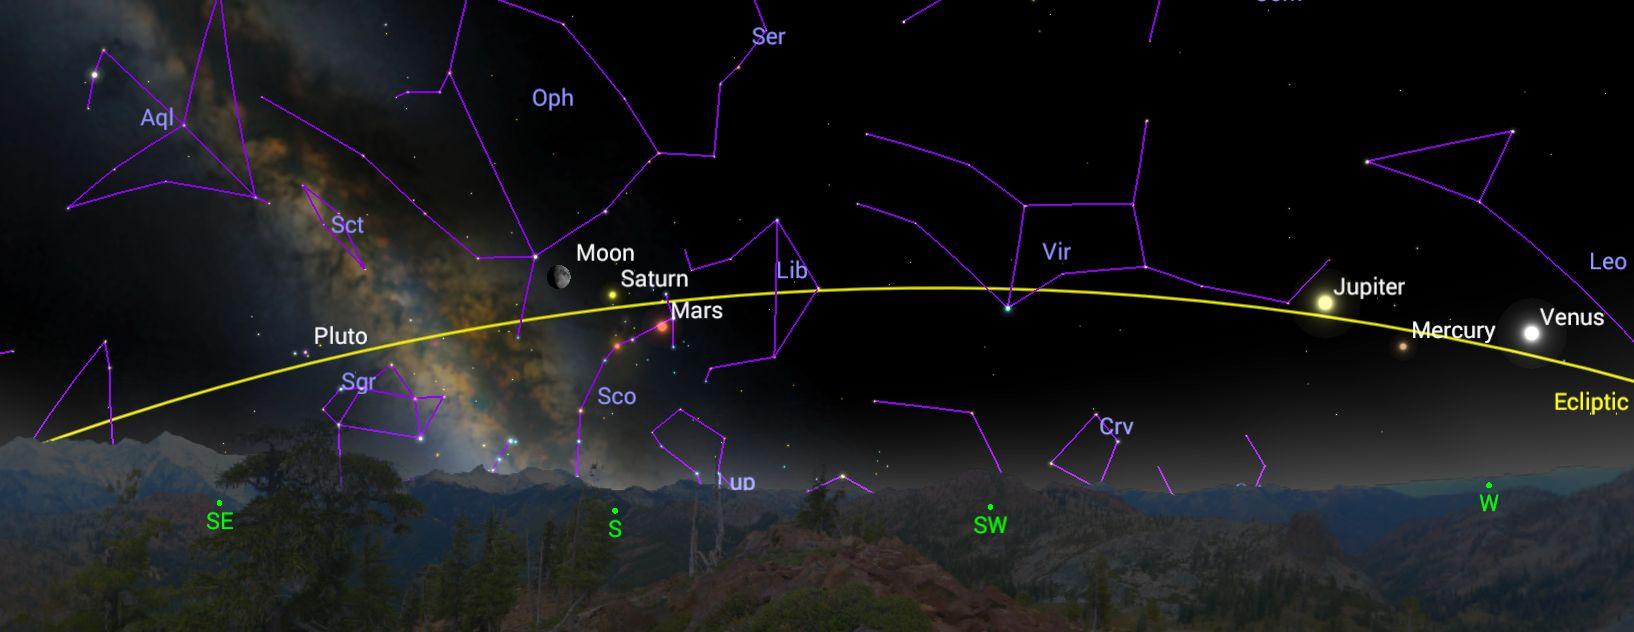 solar system plane ecliptic